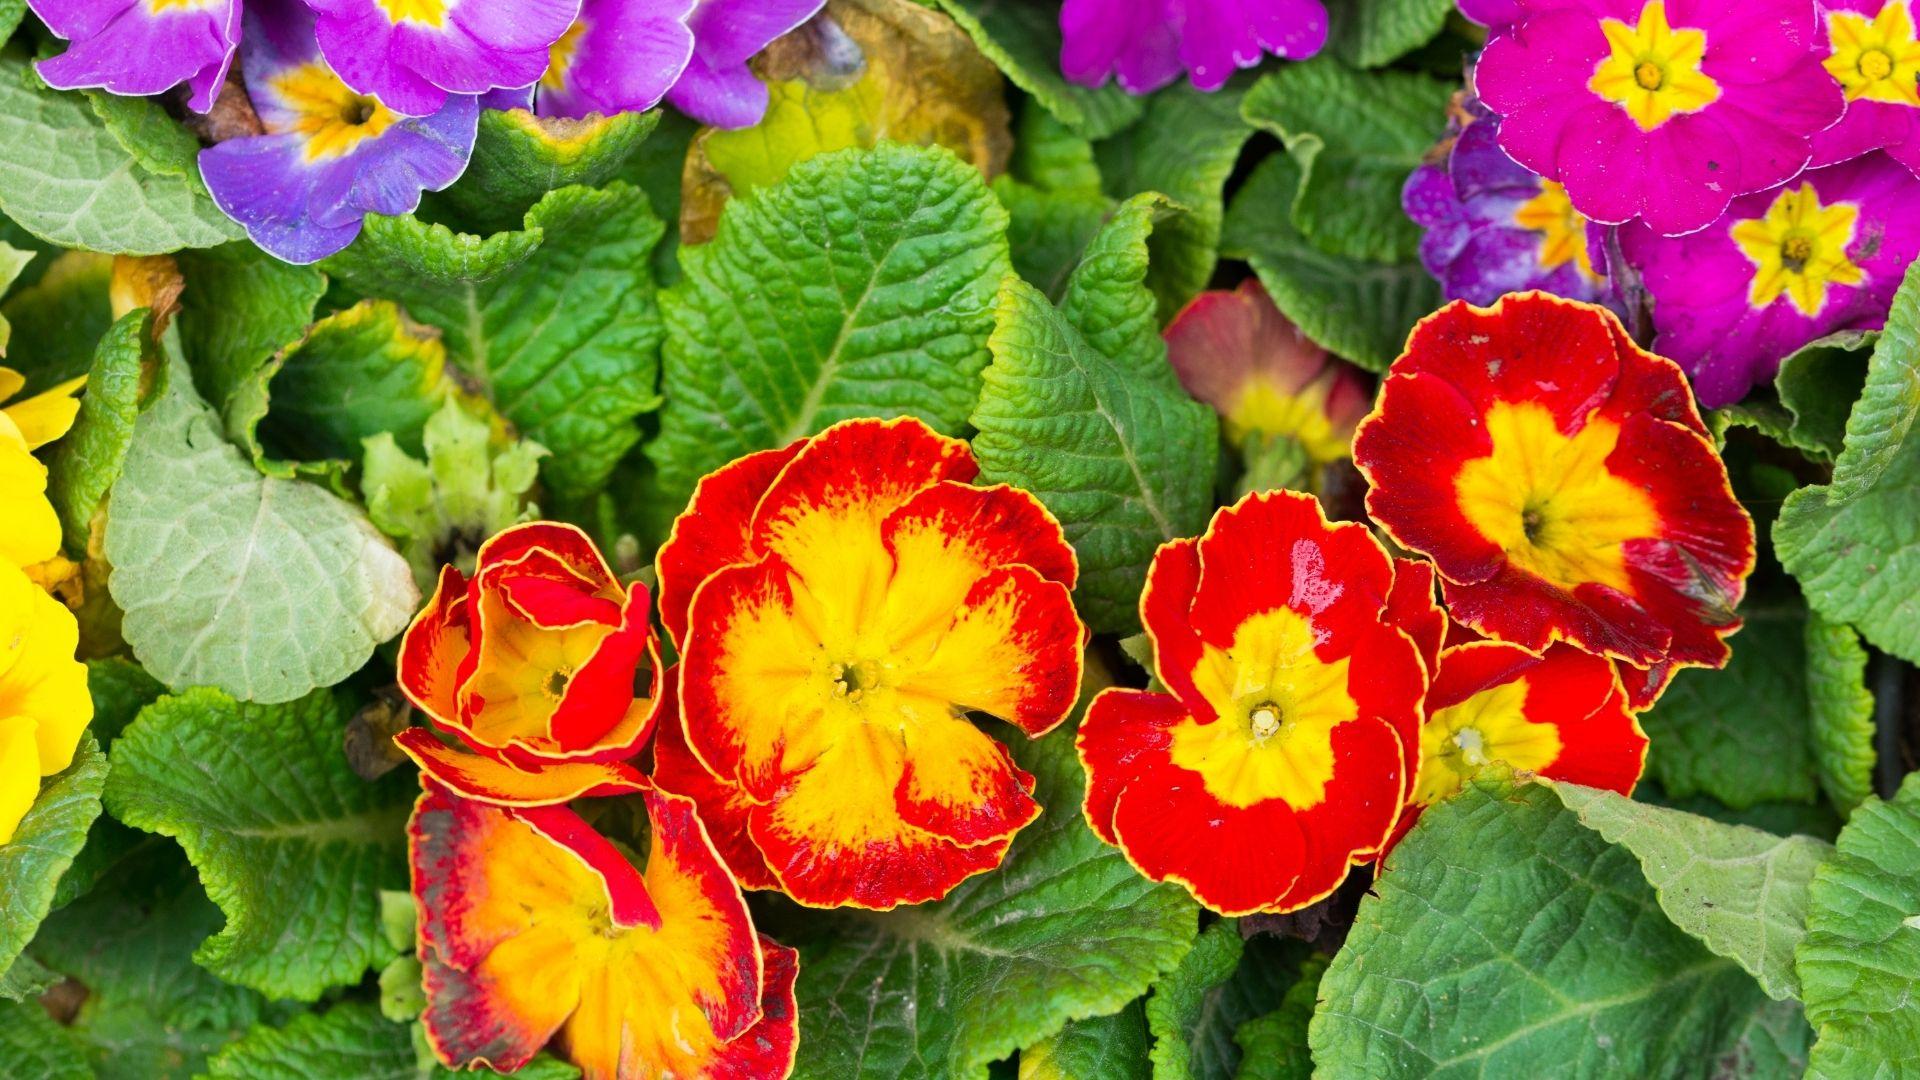 18 Types of Primrose Flowers